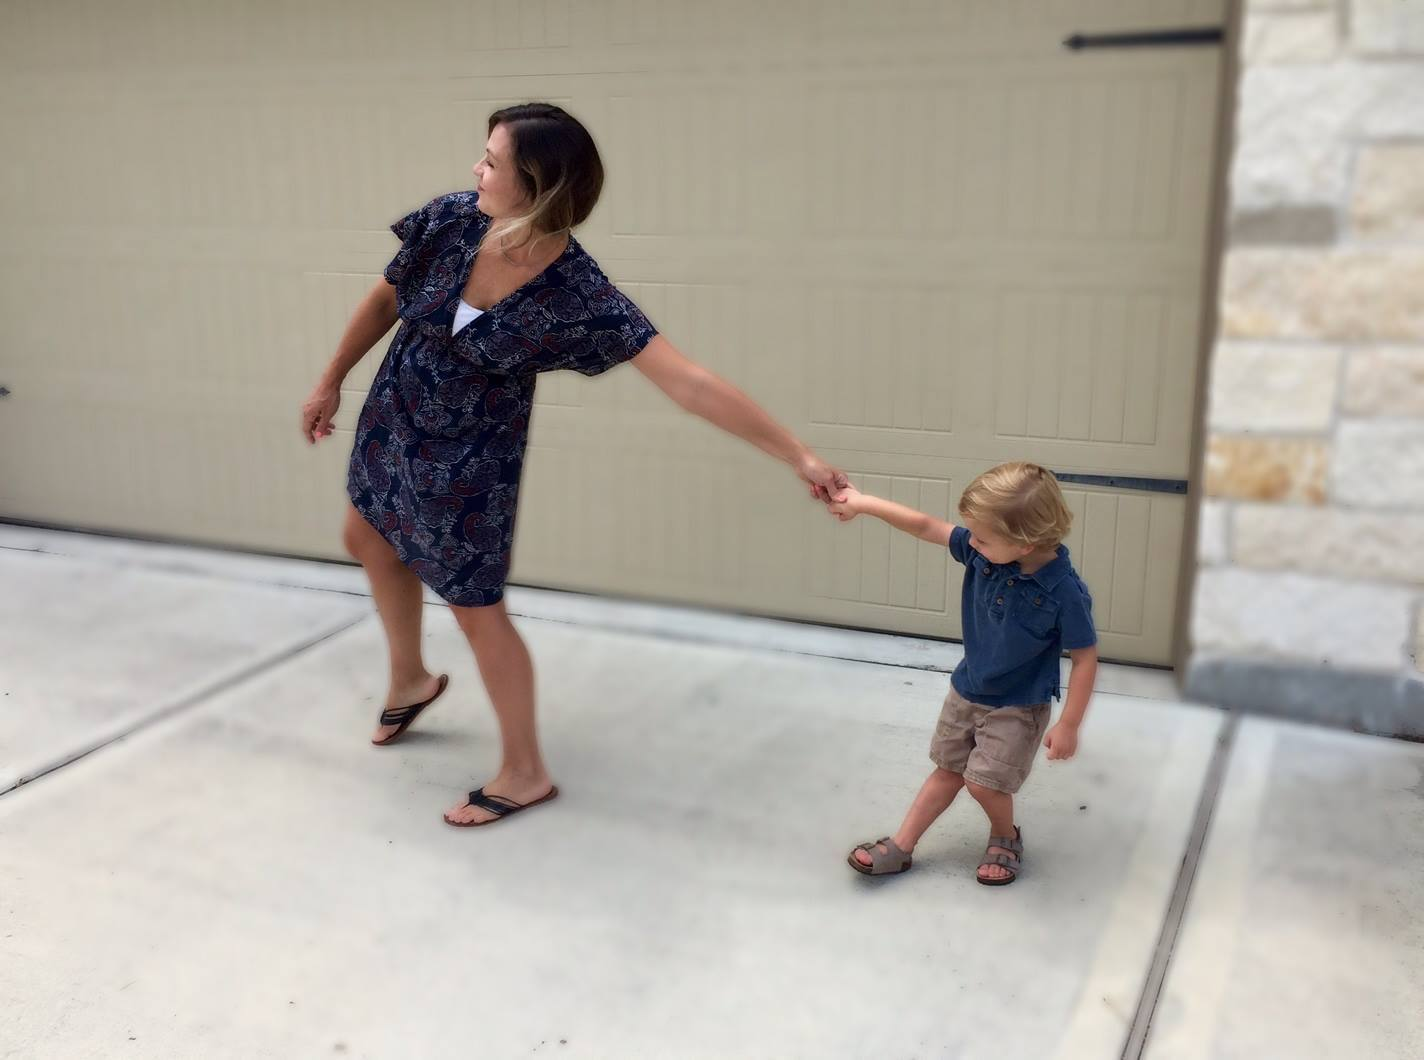 5 Reasons to Love Having a Hard-Headed Child